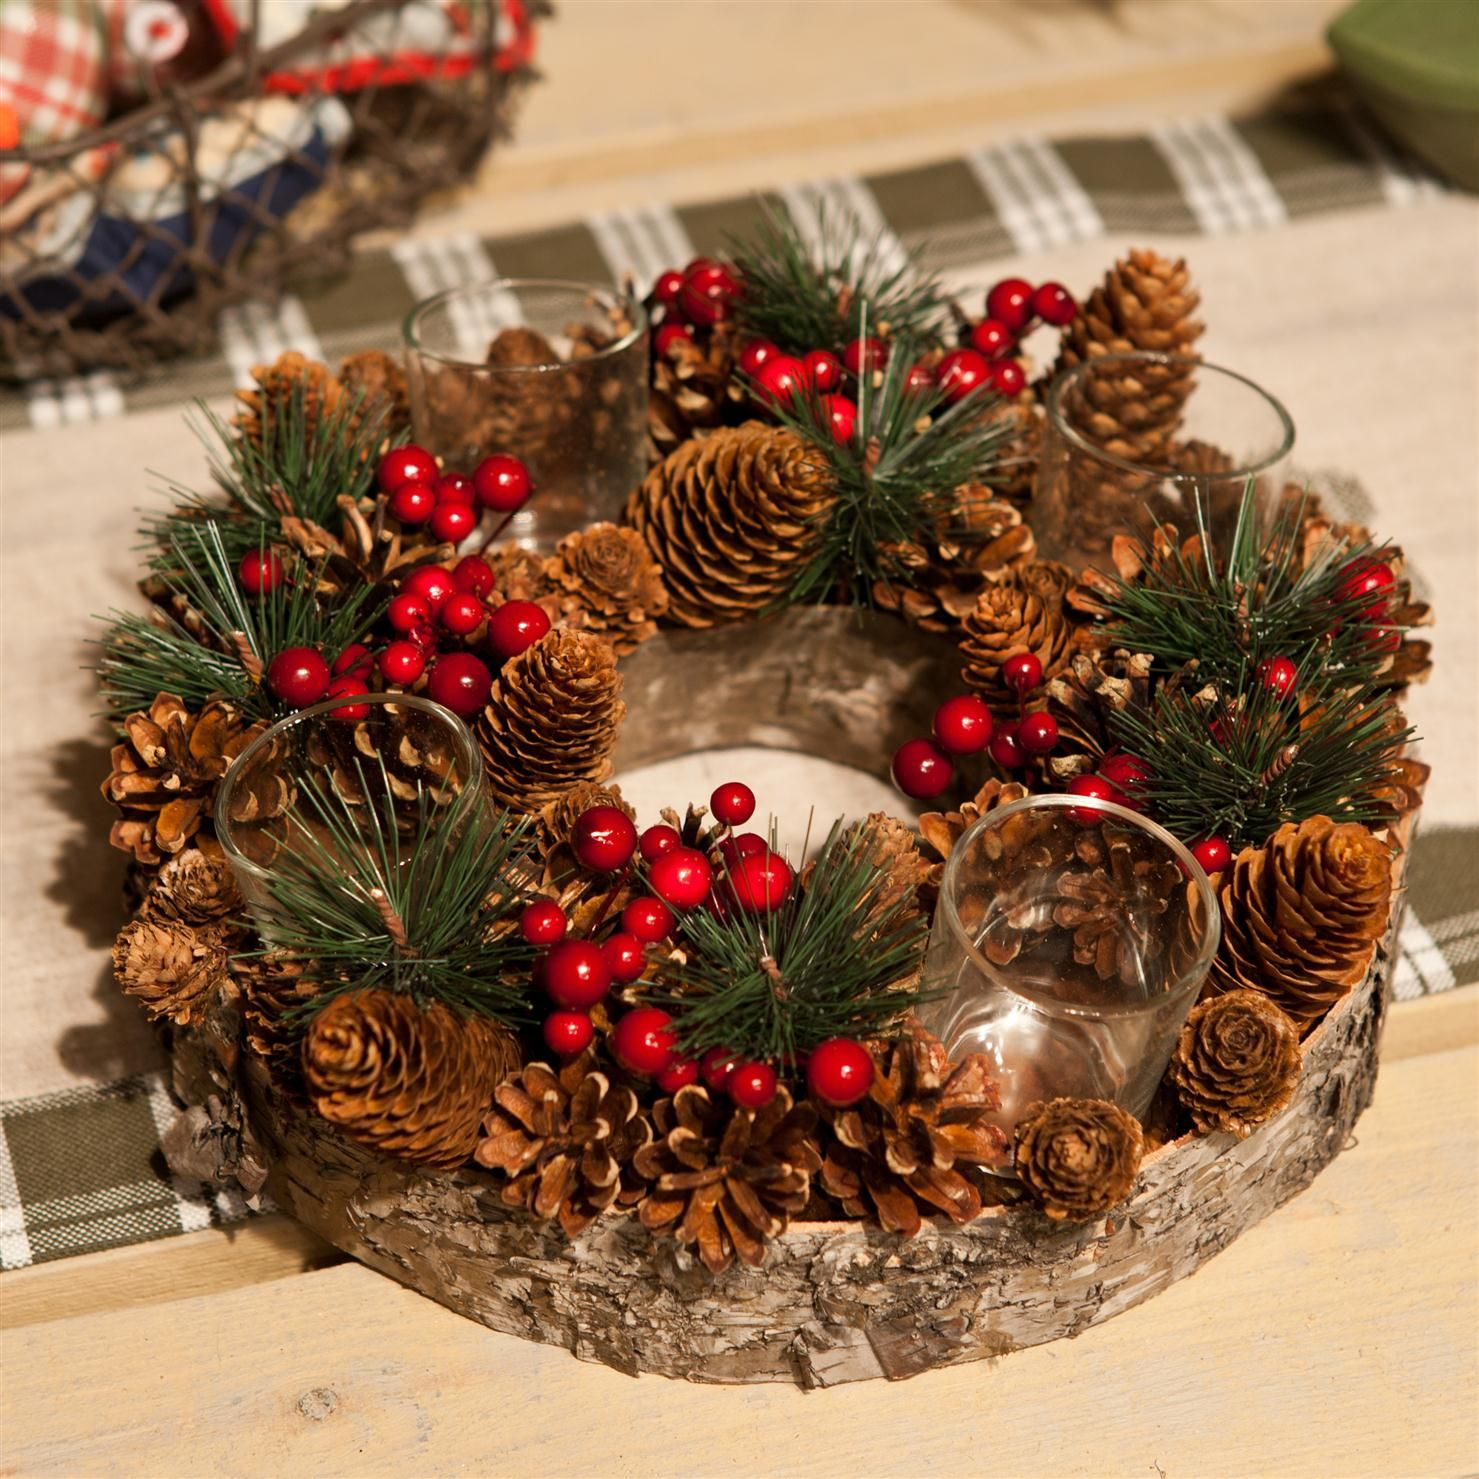 Soporte para velas de gisela graham motivos navide os achica navidad xmas navidad - Soporte para velas ...